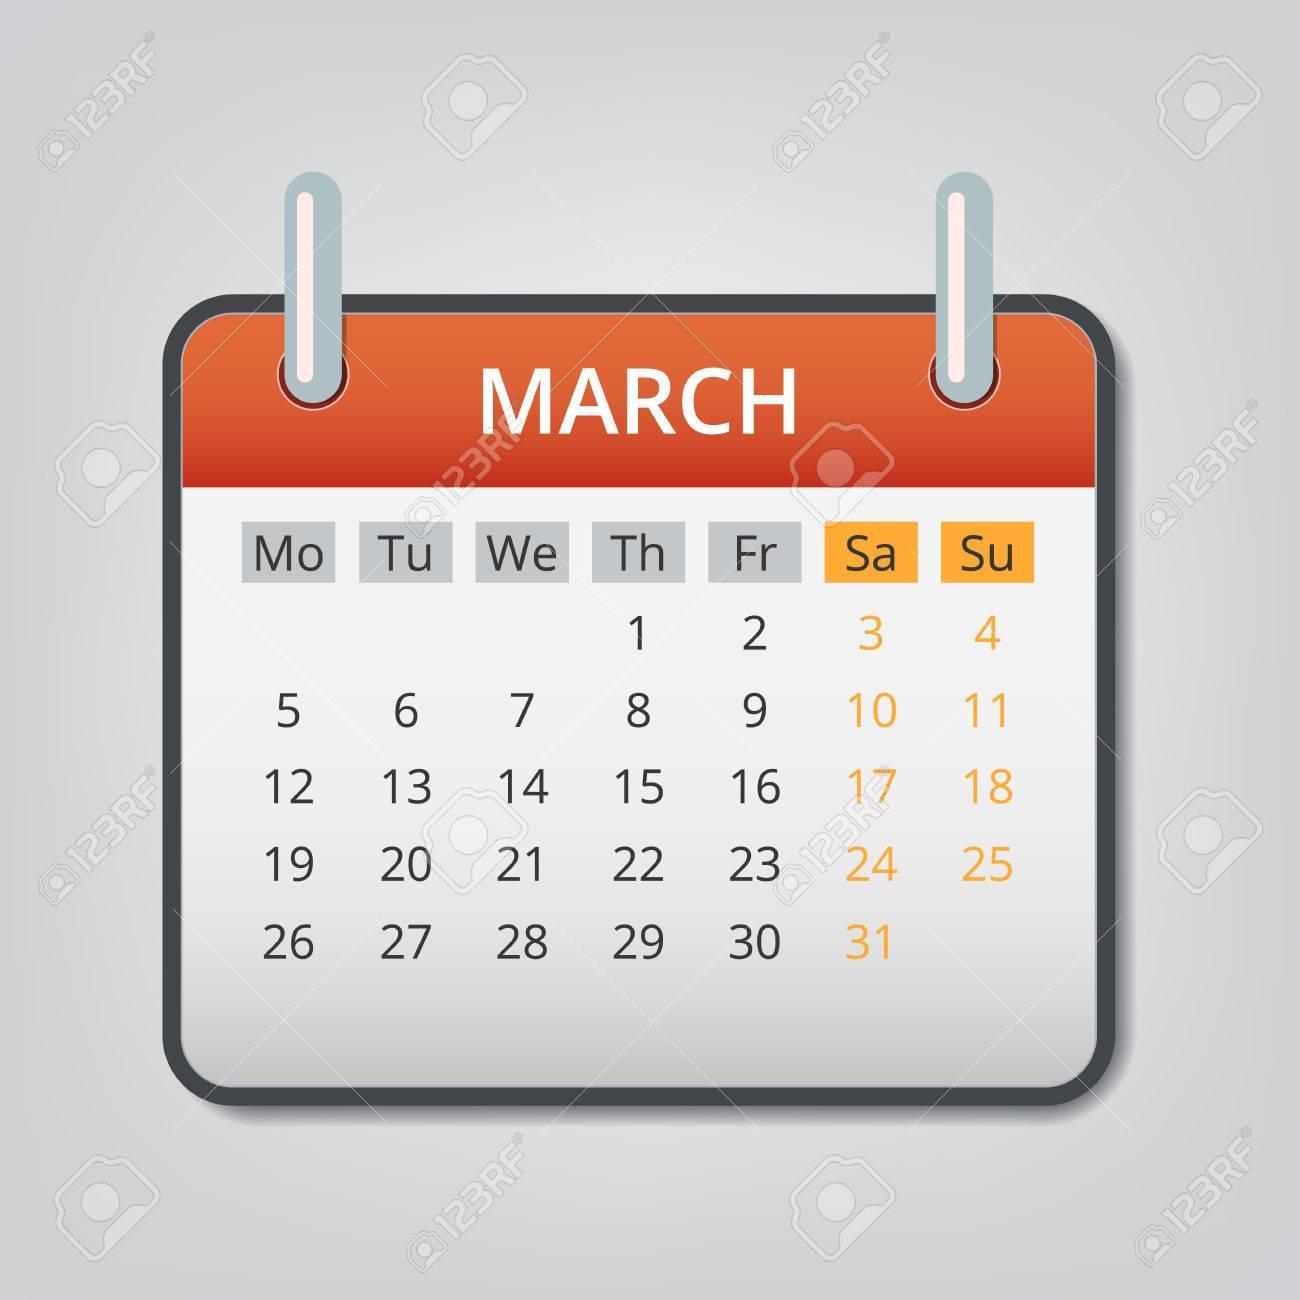 Gadget Calendario.March 2018 Calendar Concept Background Cartoon Illustration